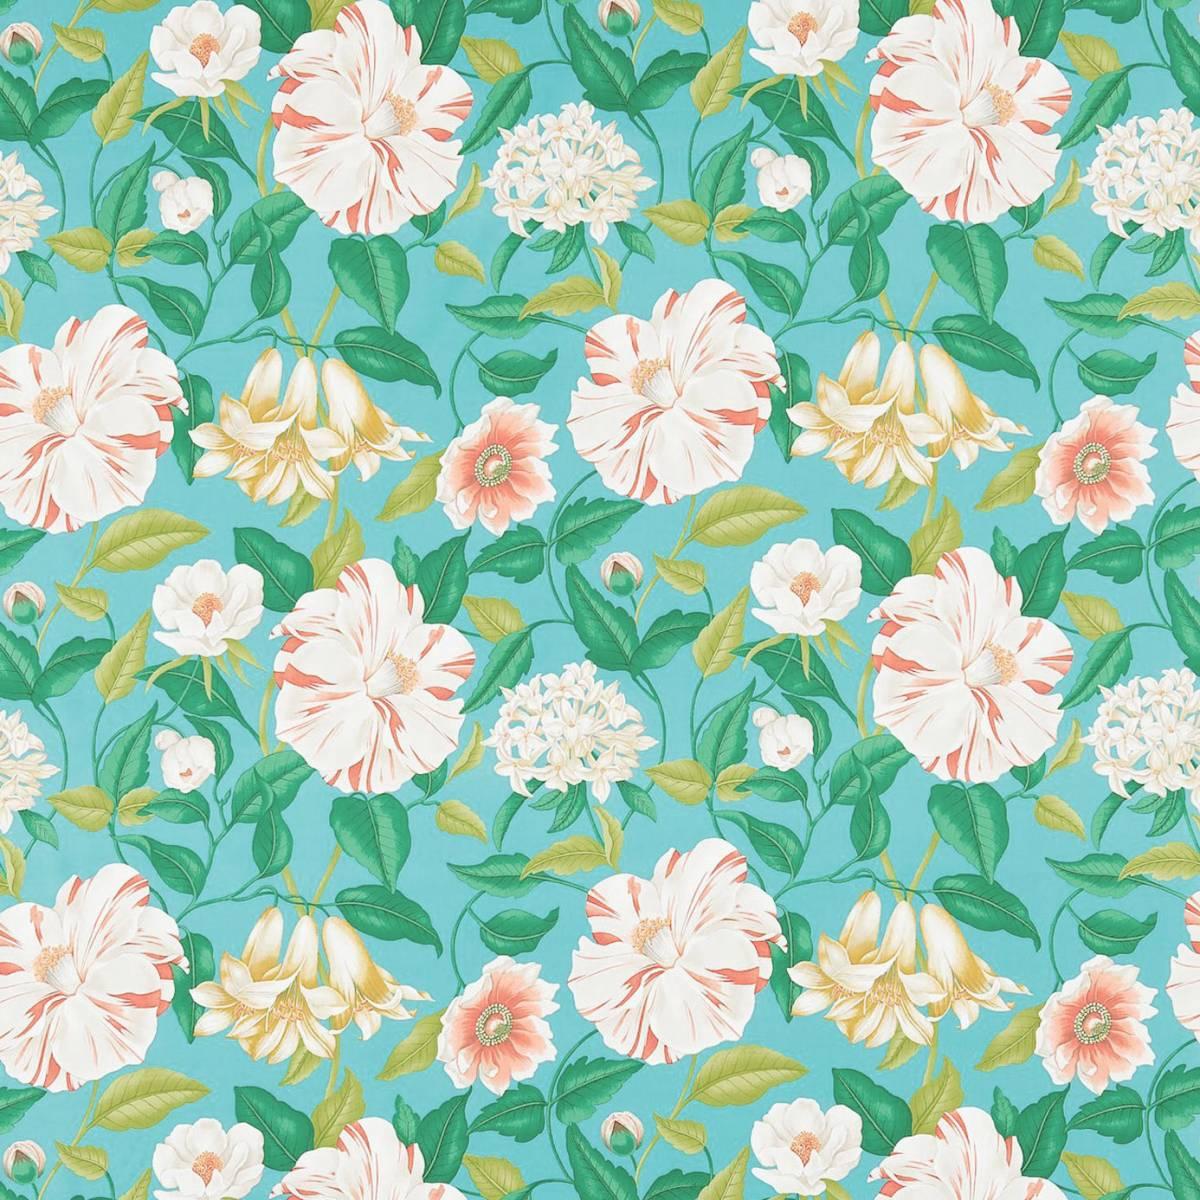 floreanna fabric turquoise 223284 sanderson voyage. Black Bedroom Furniture Sets. Home Design Ideas